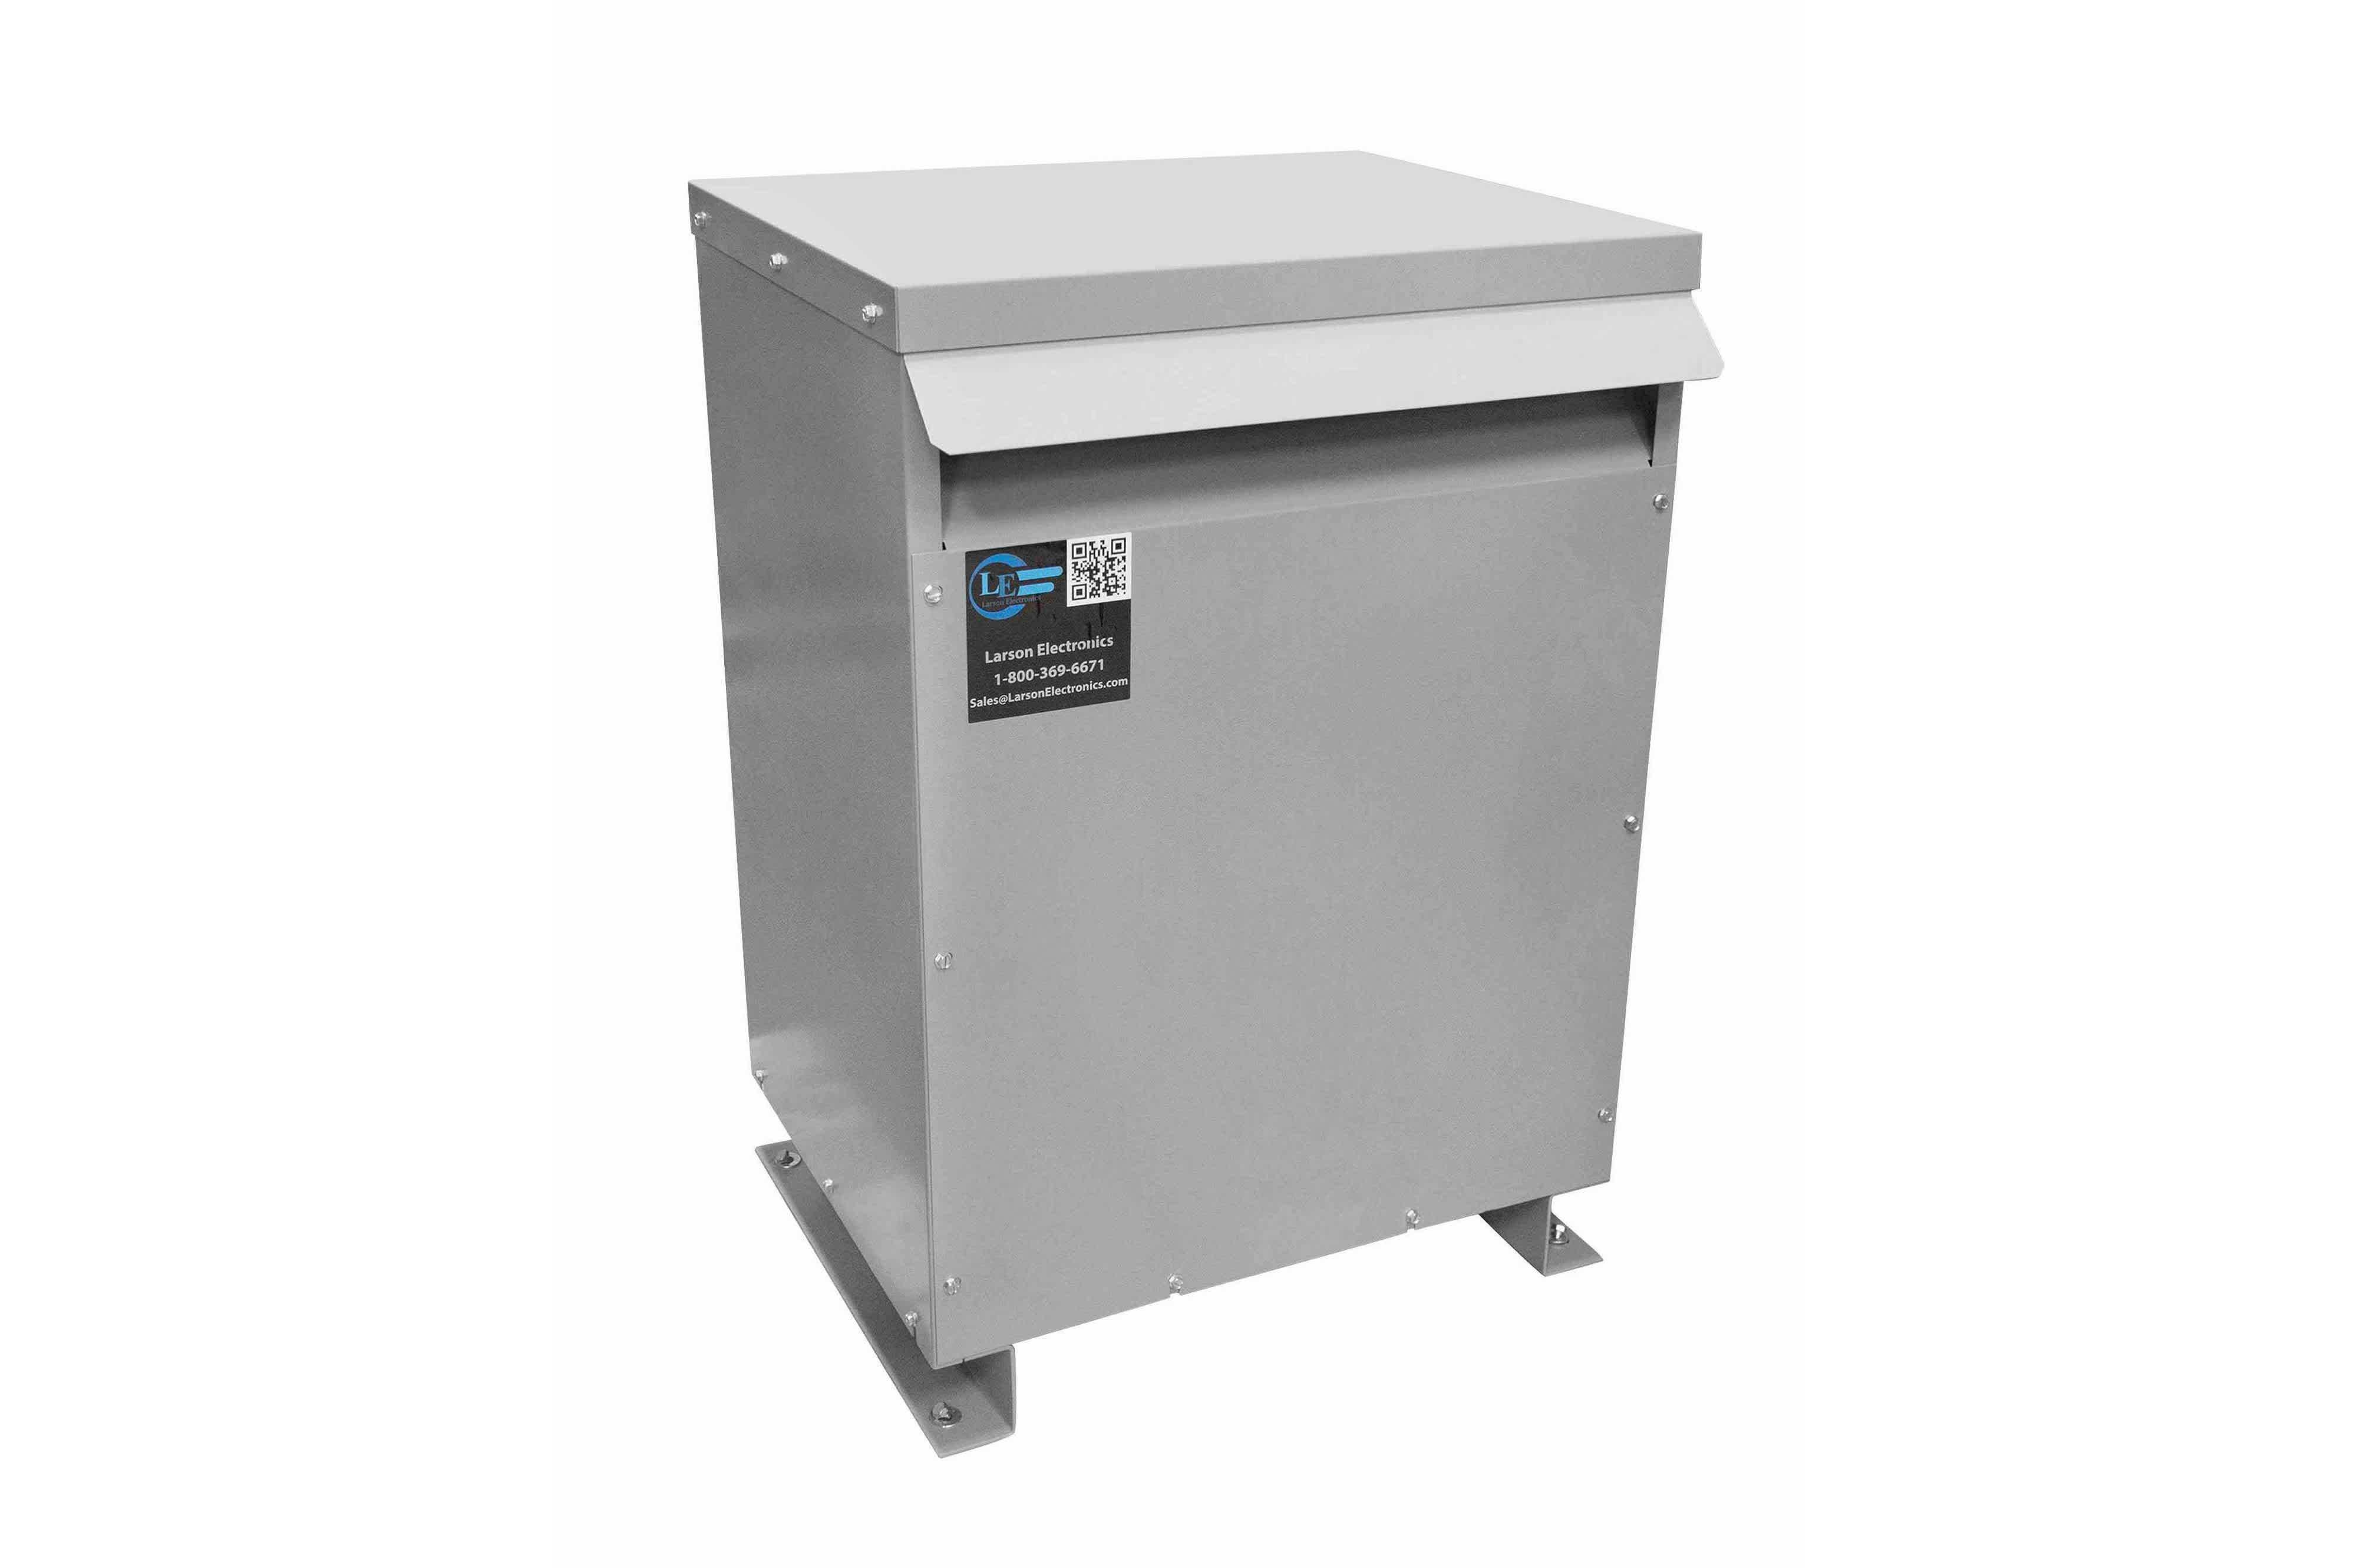 32.5 kVA 3PH Isolation Transformer, 208V Wye Primary, 400Y/231 Wye-N Secondary, N3R, Ventilated, 60 Hz